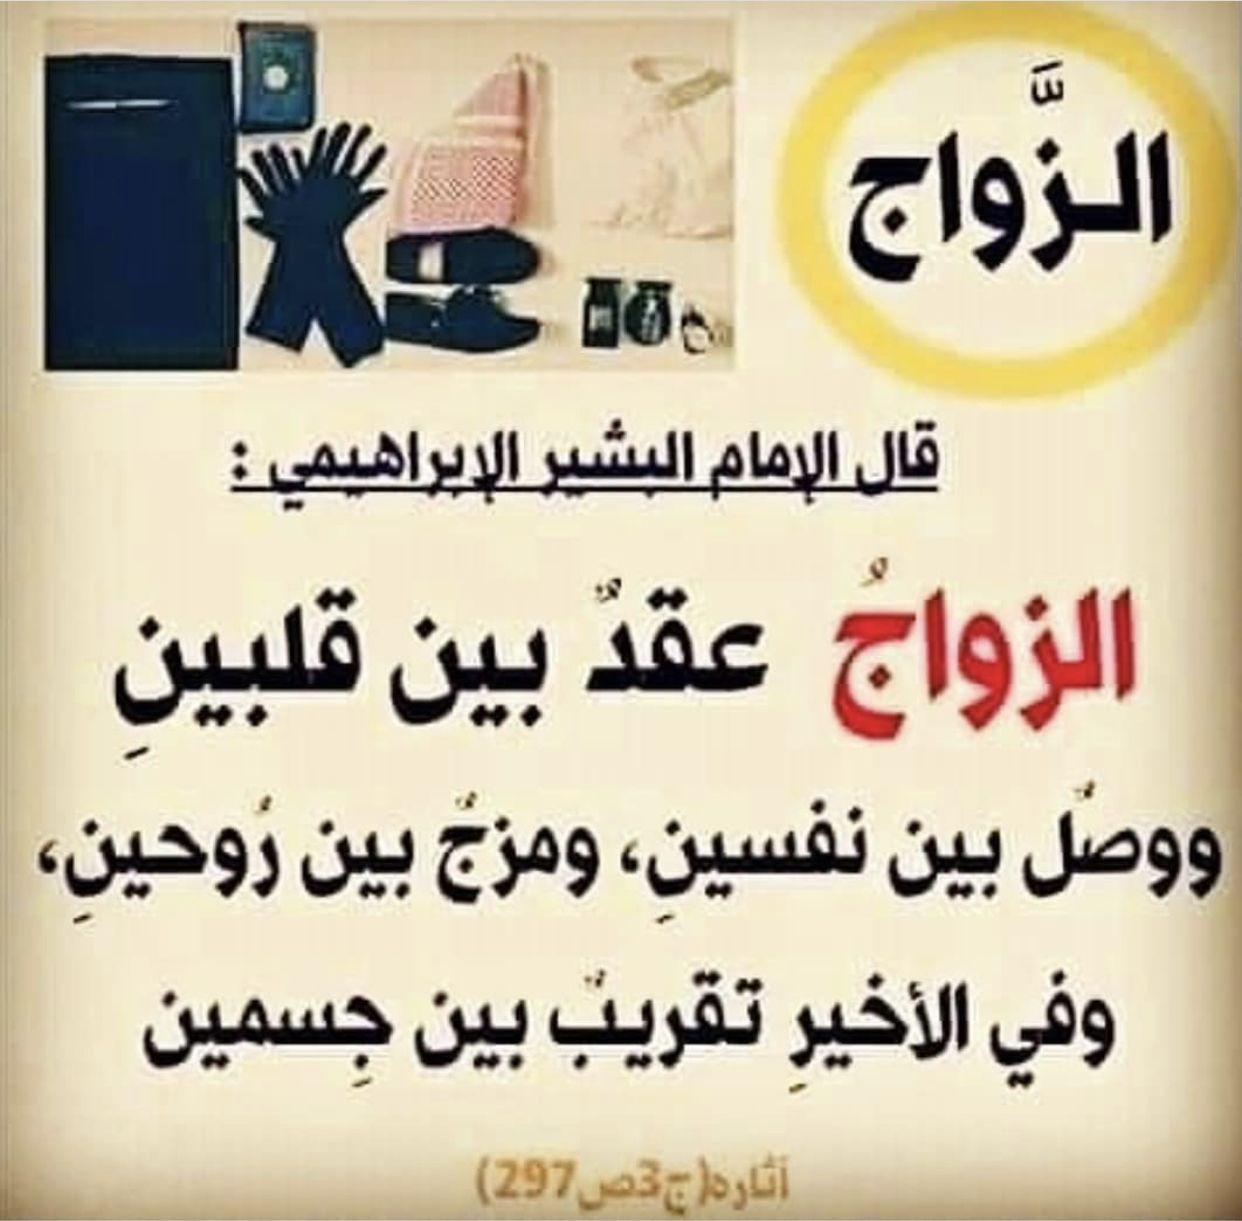 Pin By الأثر الجميل On أقوال الصحابة والعلماء Words Home Decor Decals Tech Company Logos